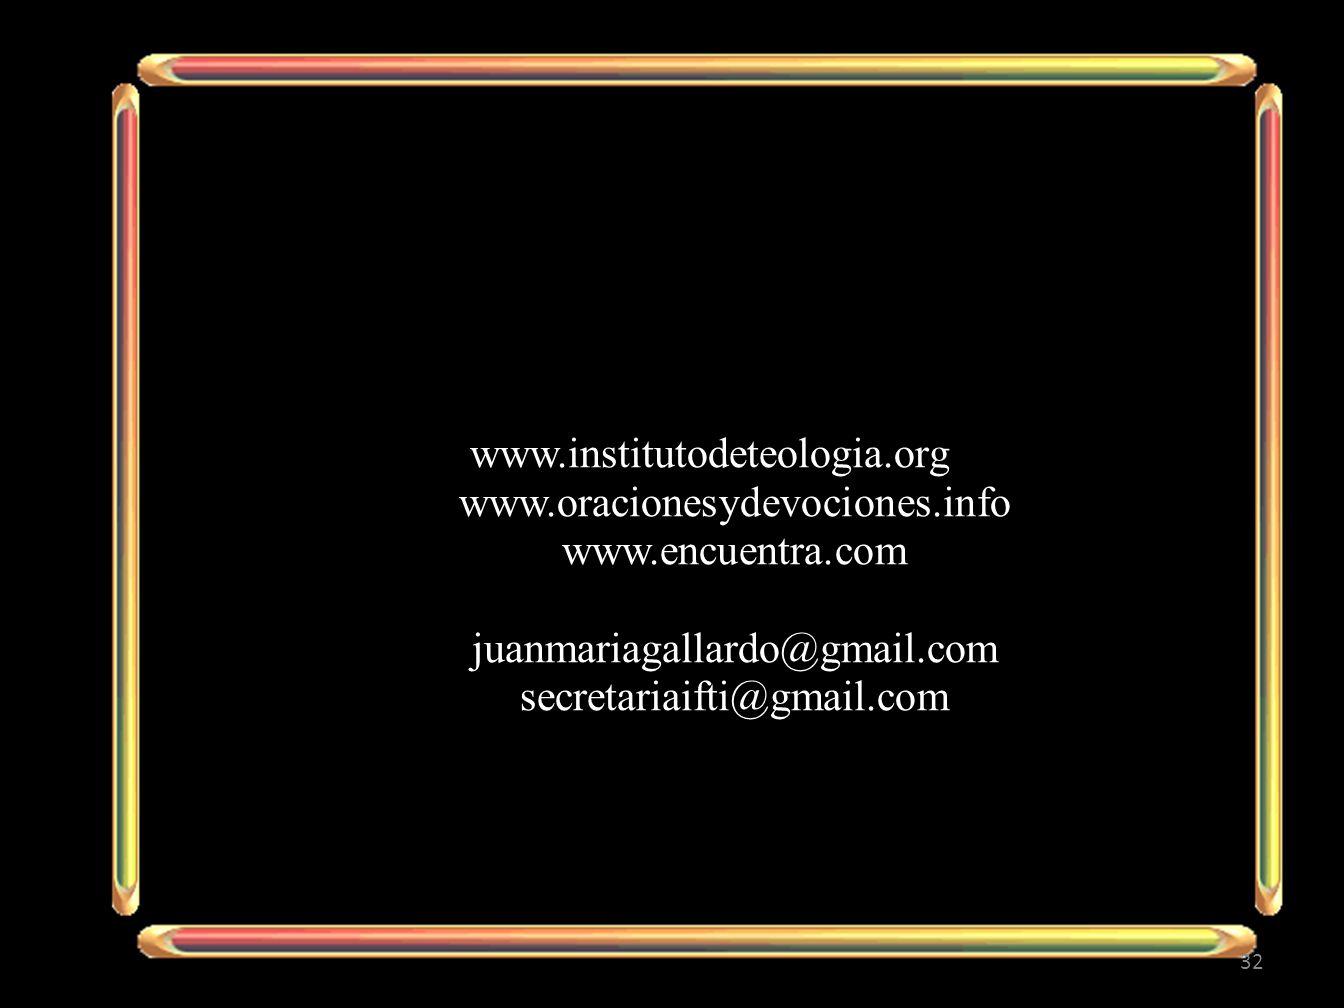 www.institutodeteologia.org www.oracionesydevociones.info. www.encuentra.com. juanmariagallardo@gmail.com.